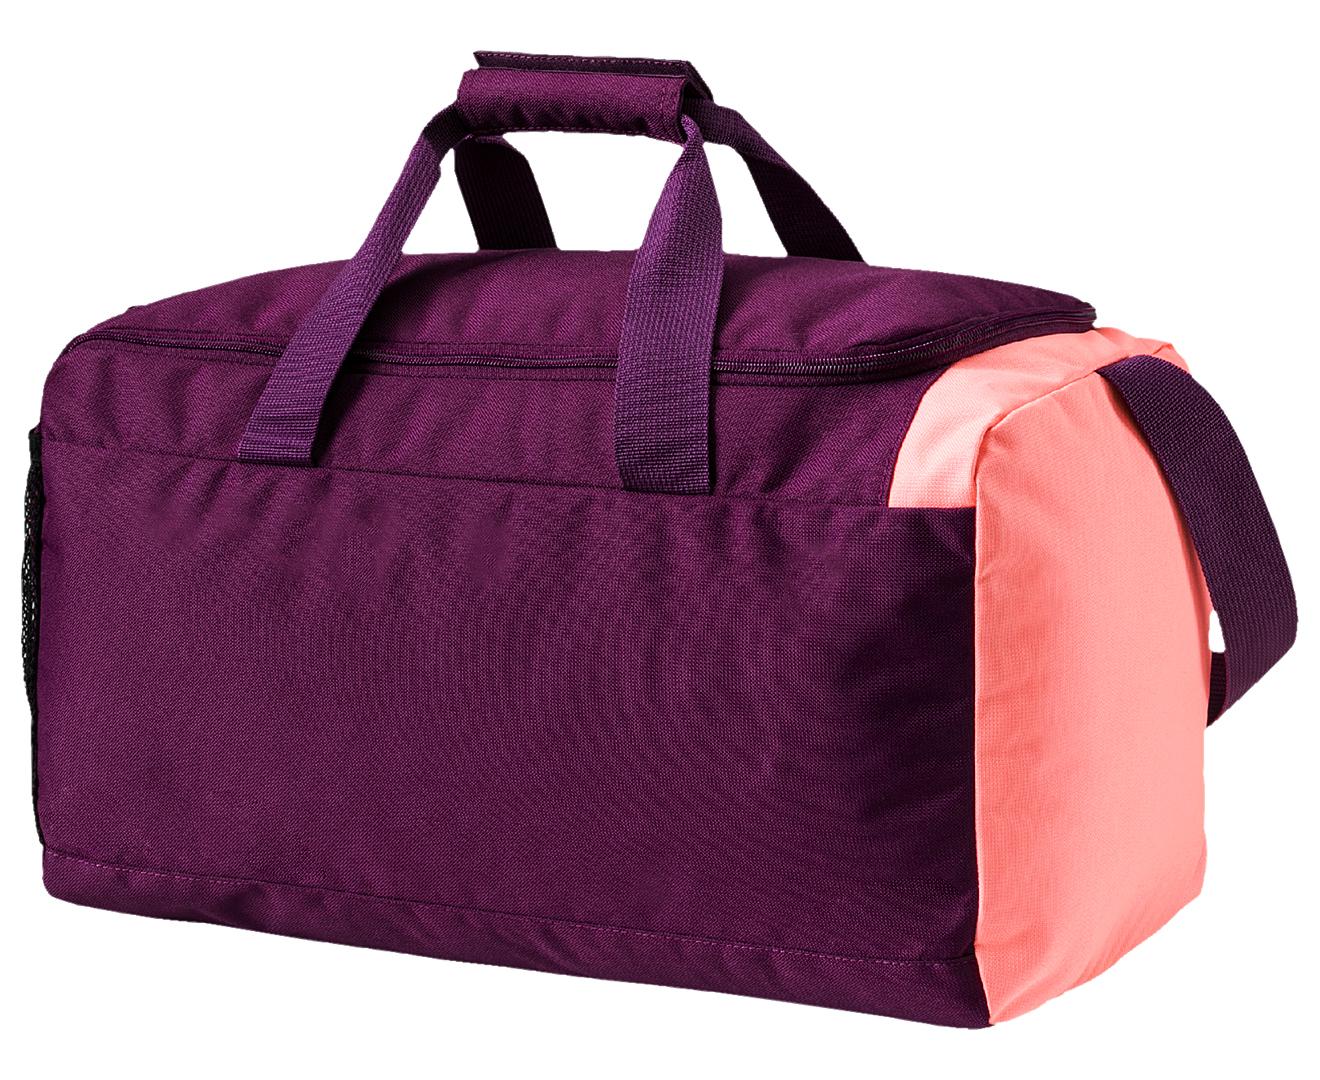 e1ee92ea0f Puma Fundamentals Sports Bag Small - Dark Purple